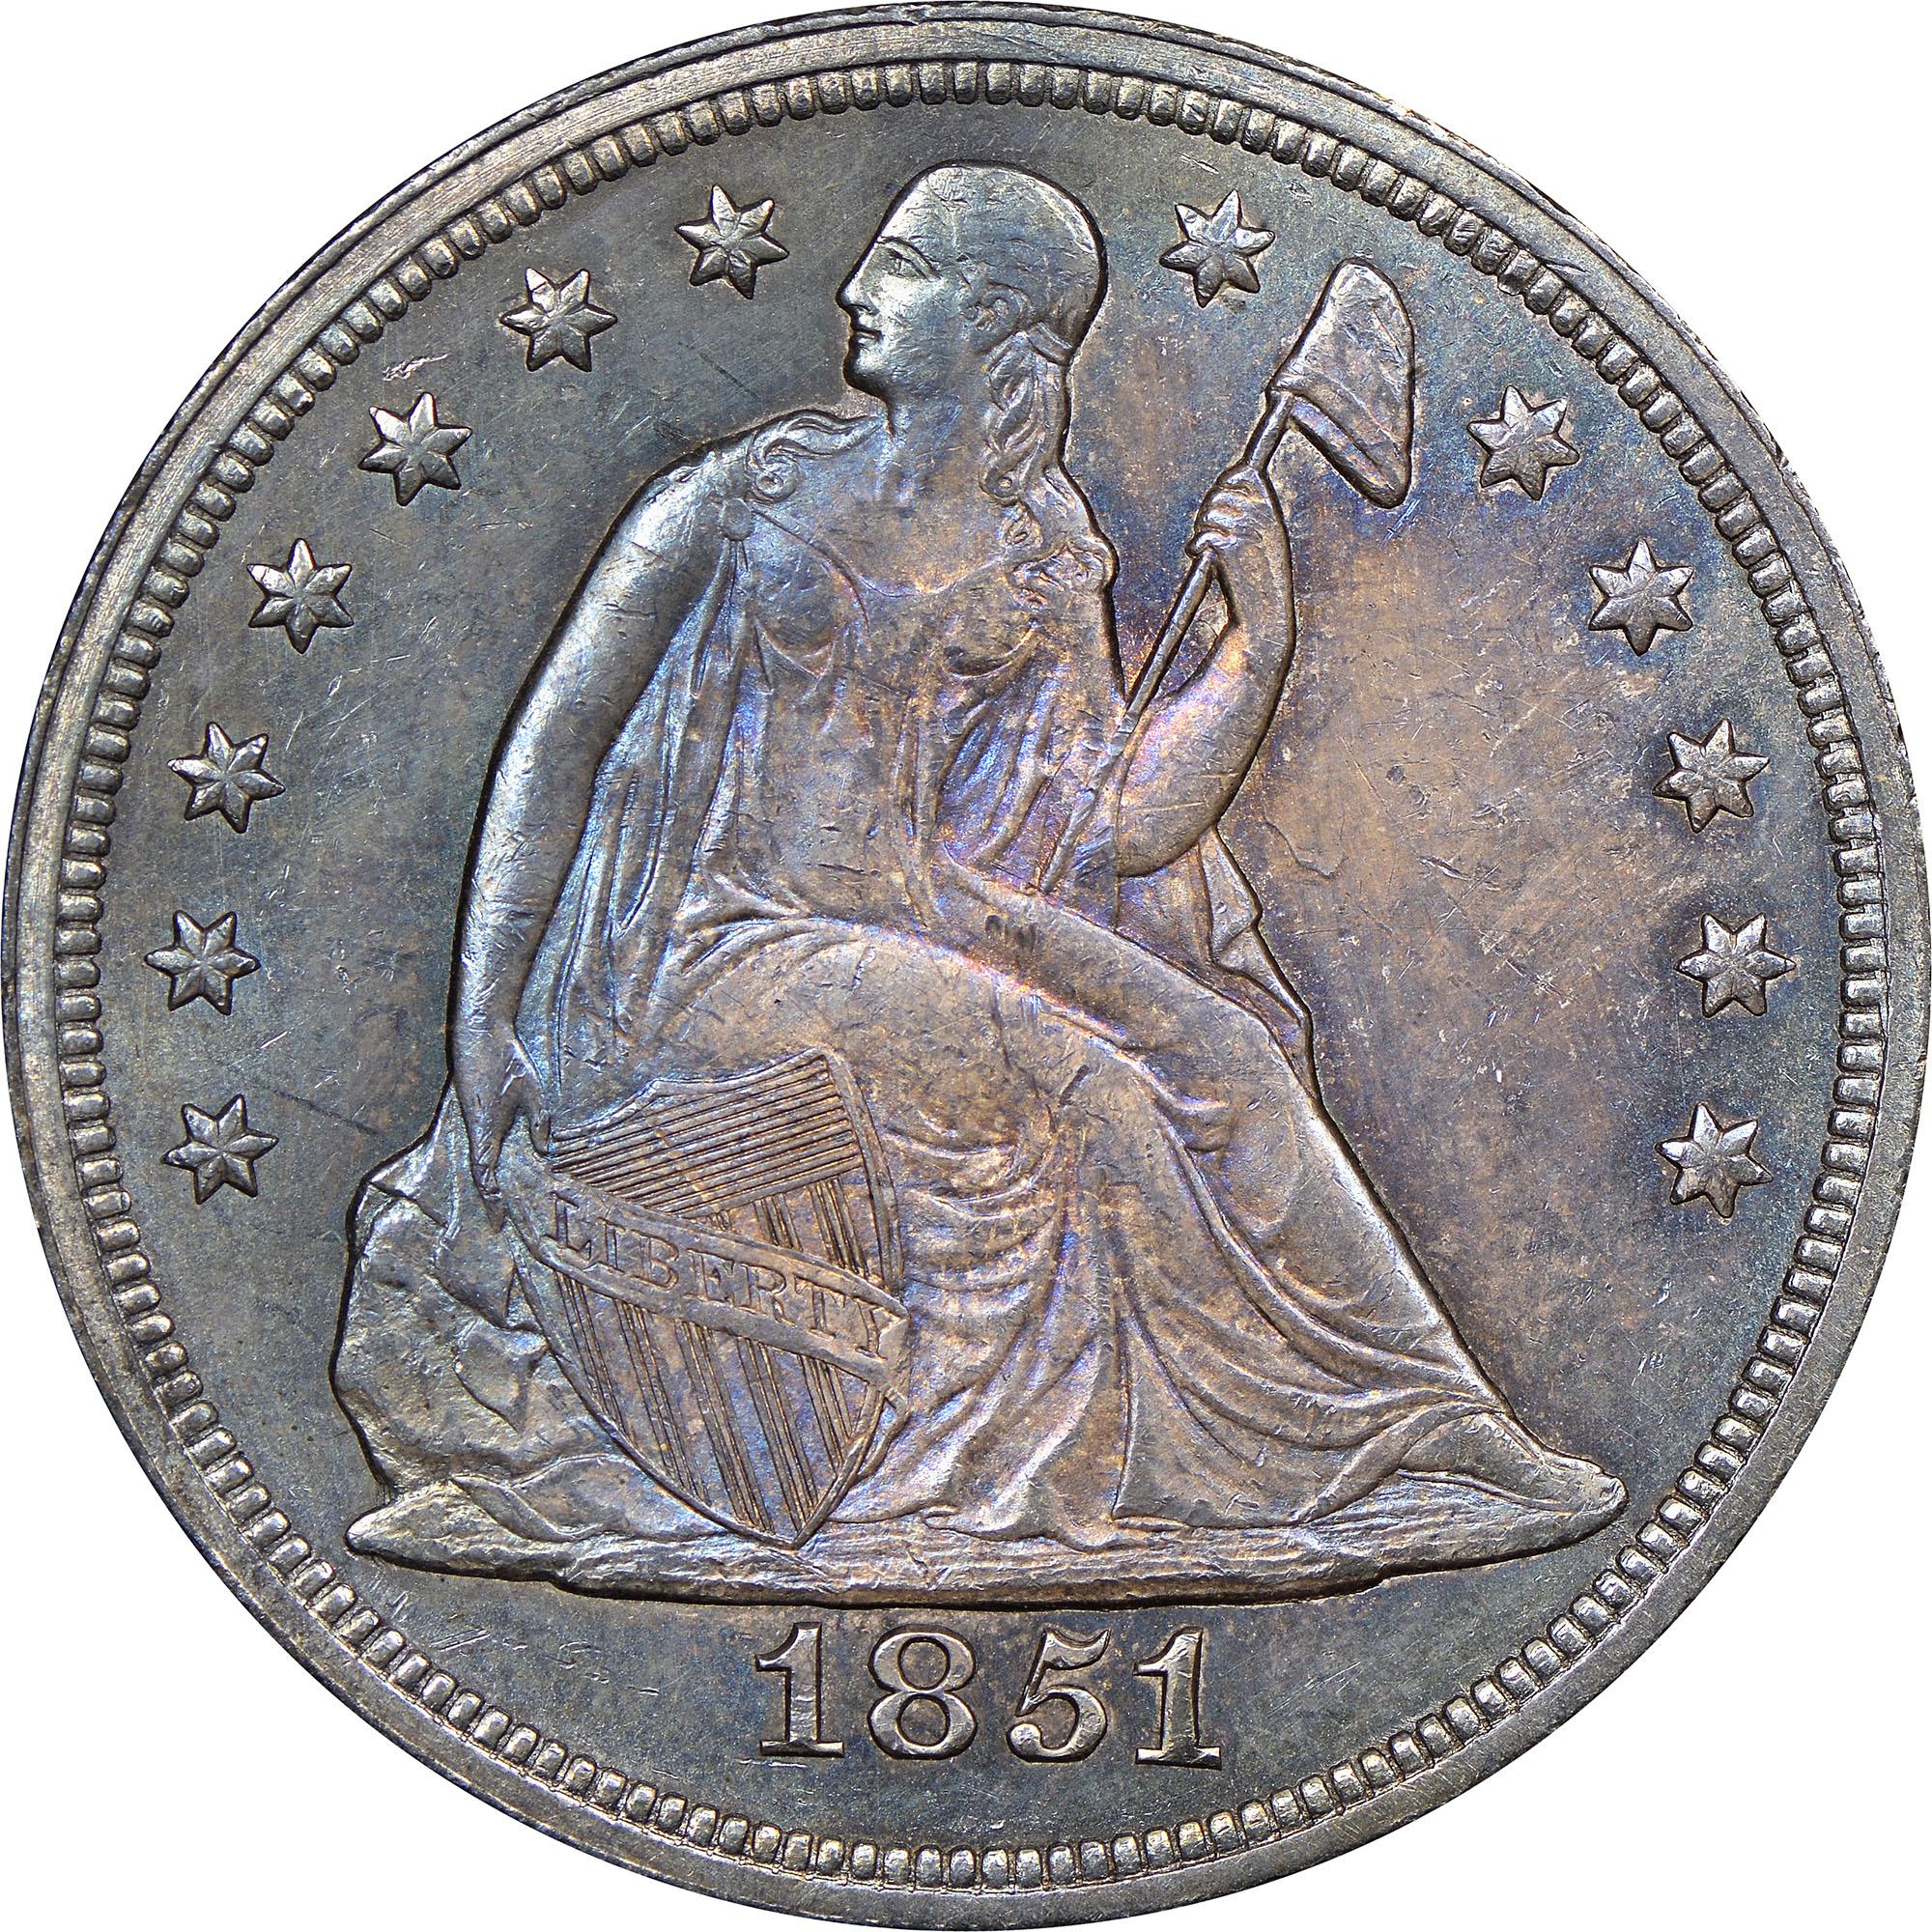 1851 1 Ms Seated Liberty Dollars Ngc